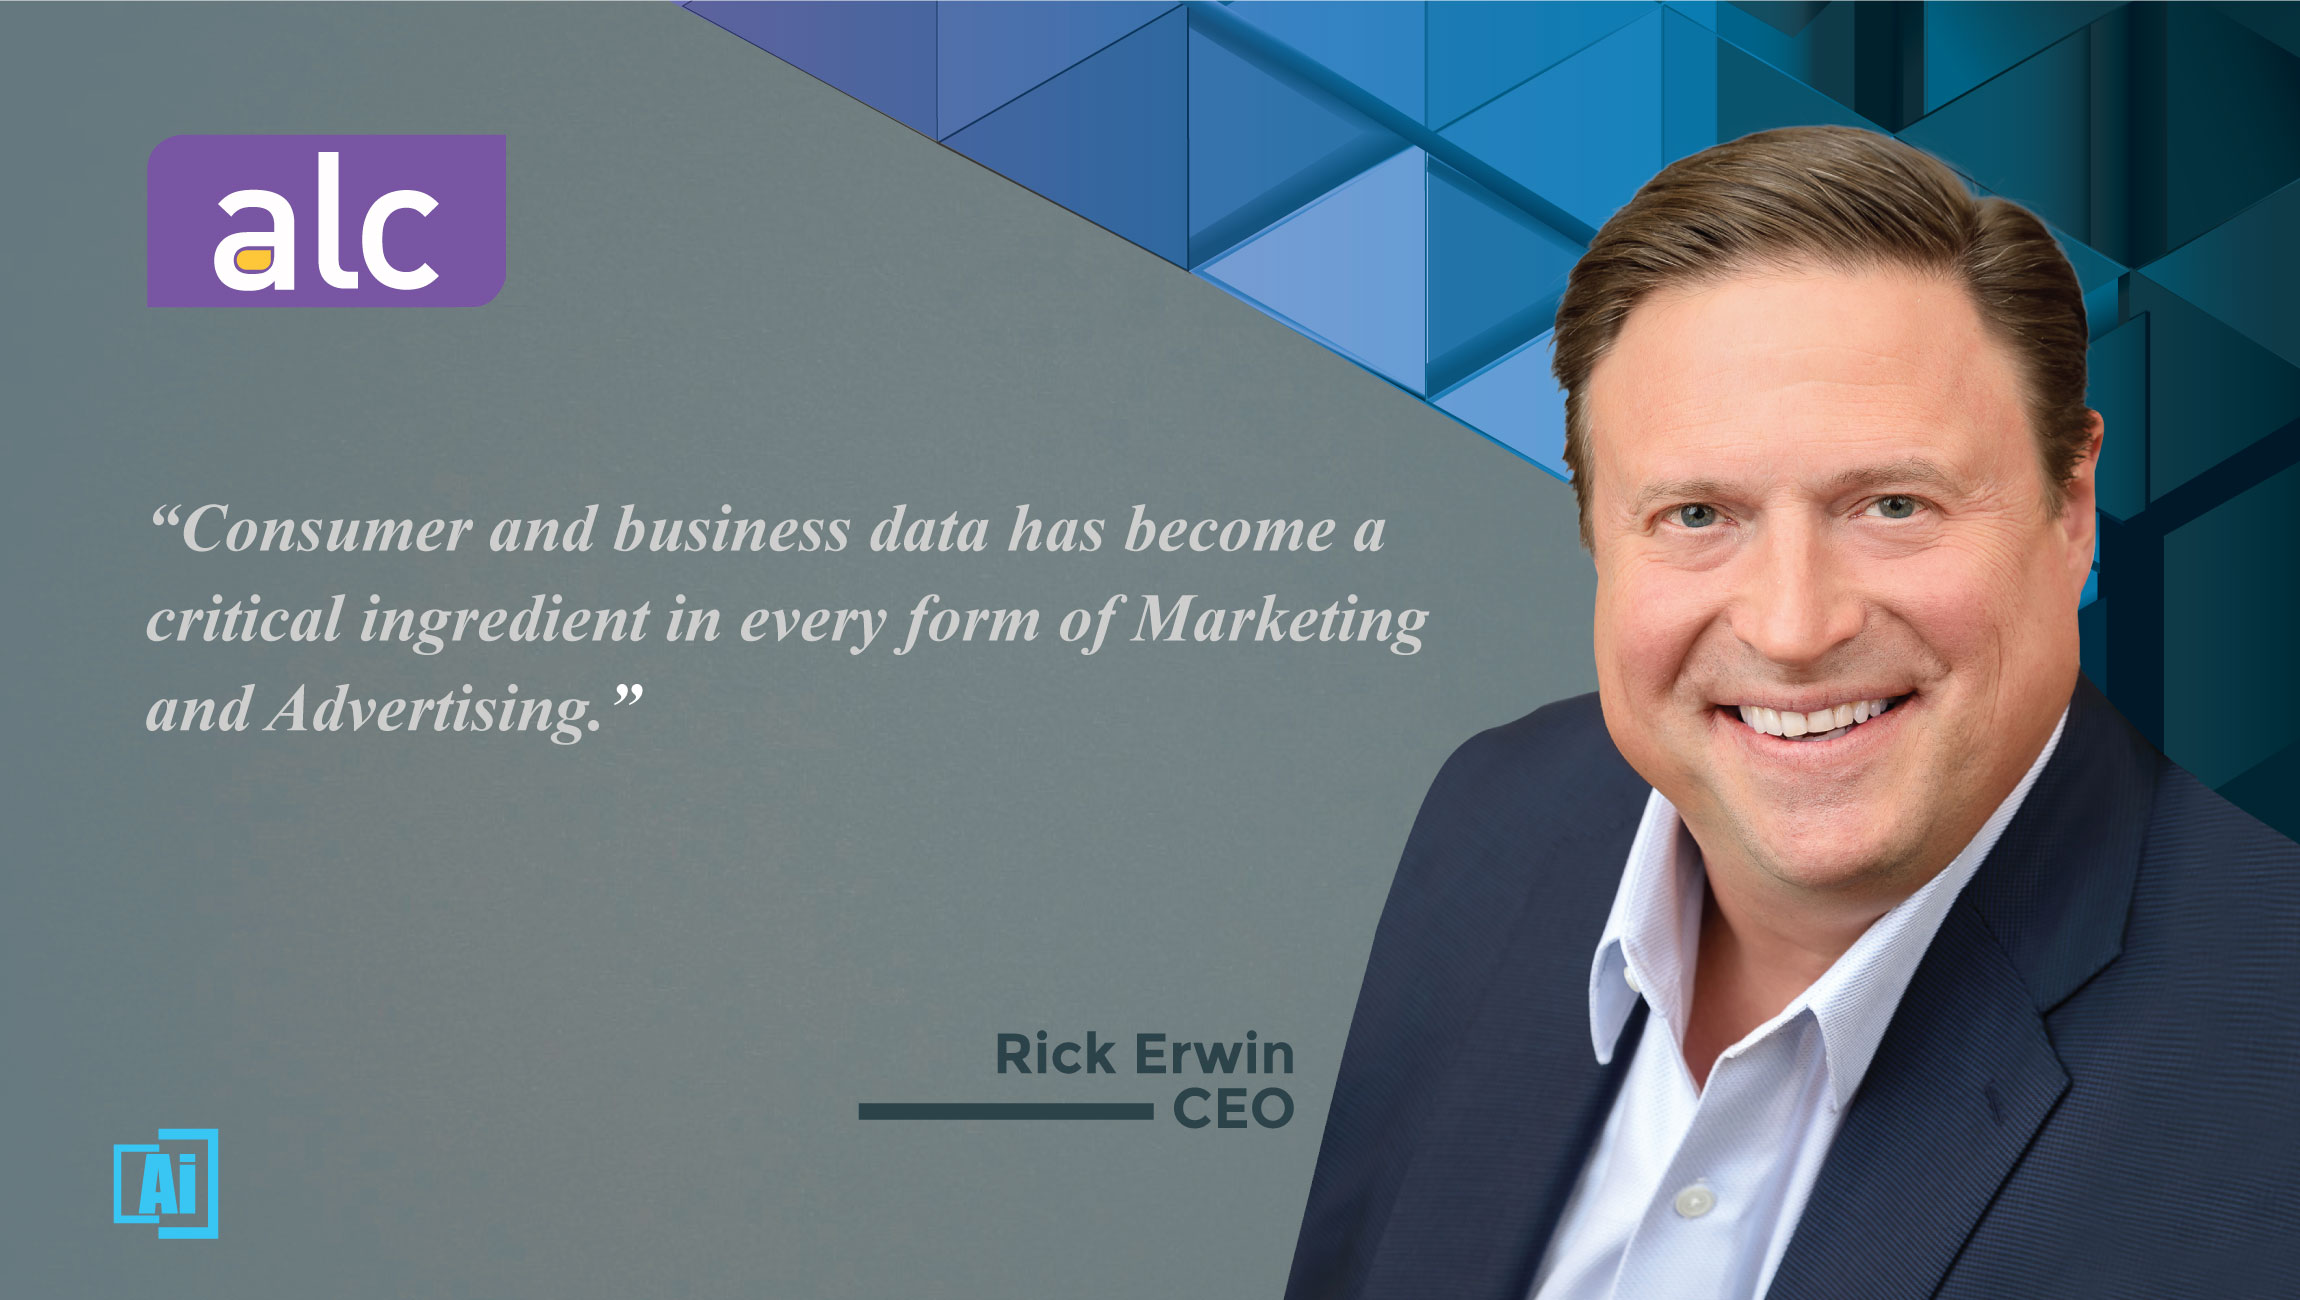 Rick-Erwin_Qcard